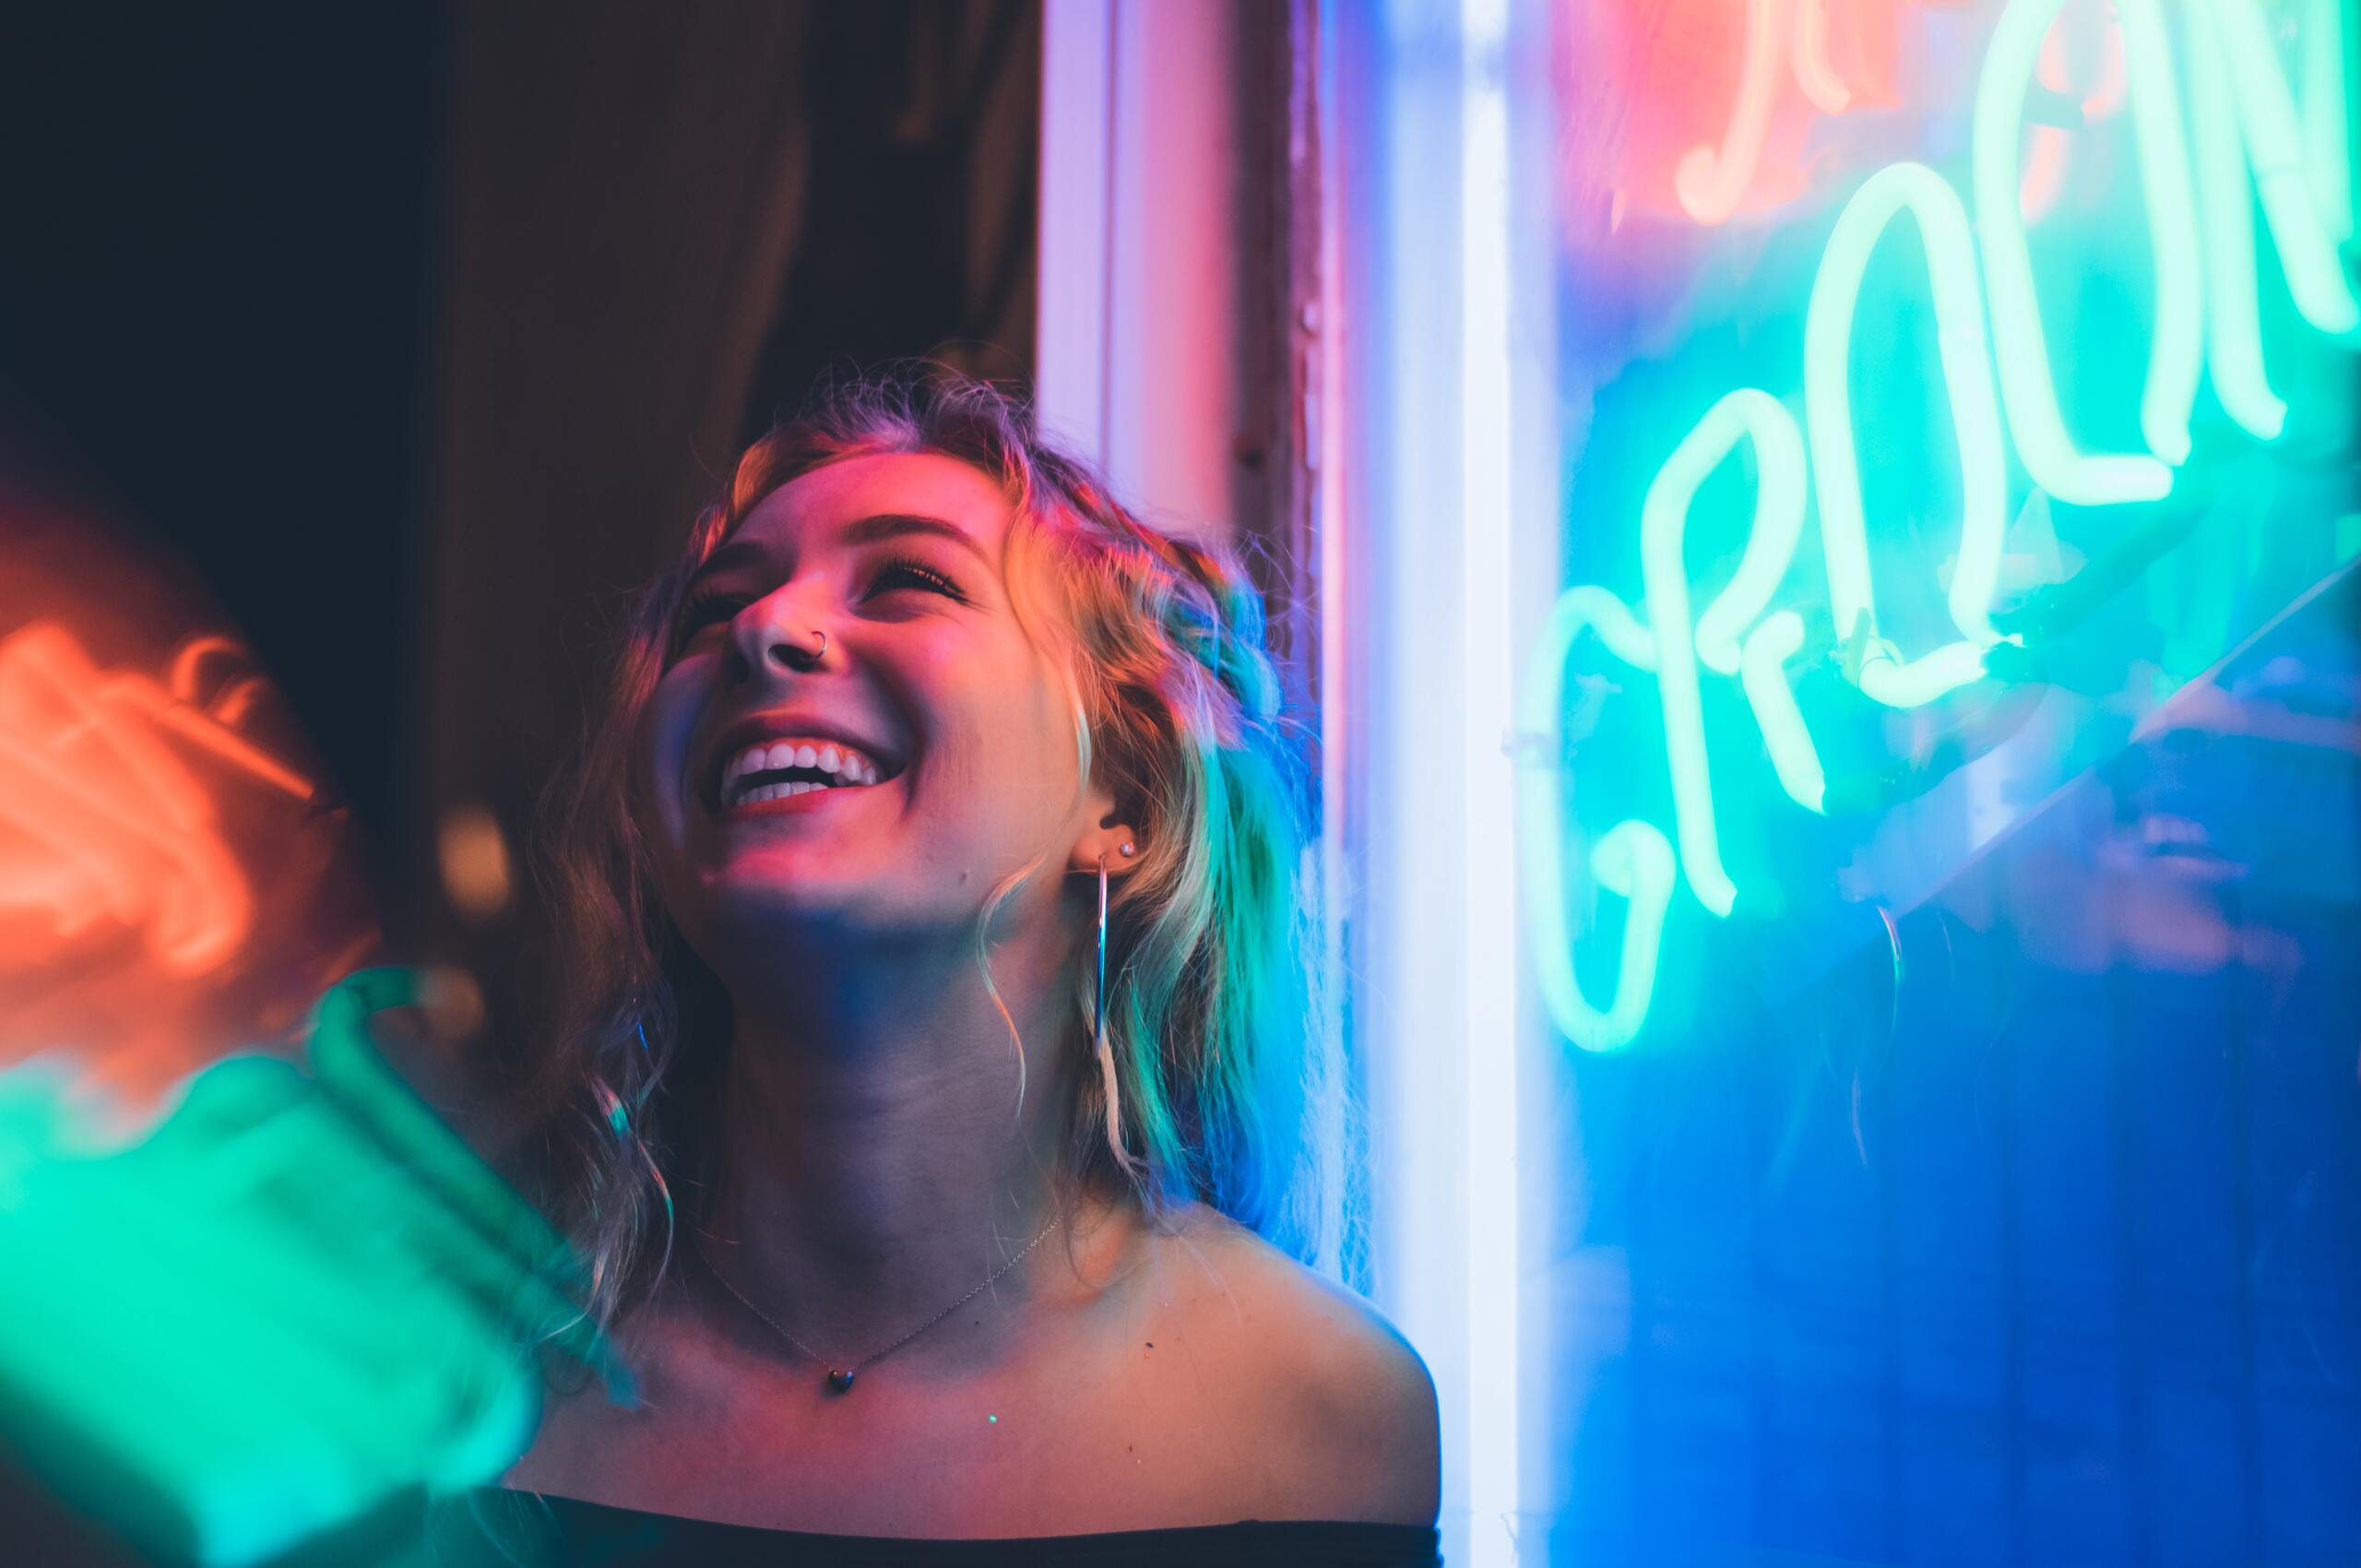 woman-smiling-near-glass-window-5k-v3.jpg